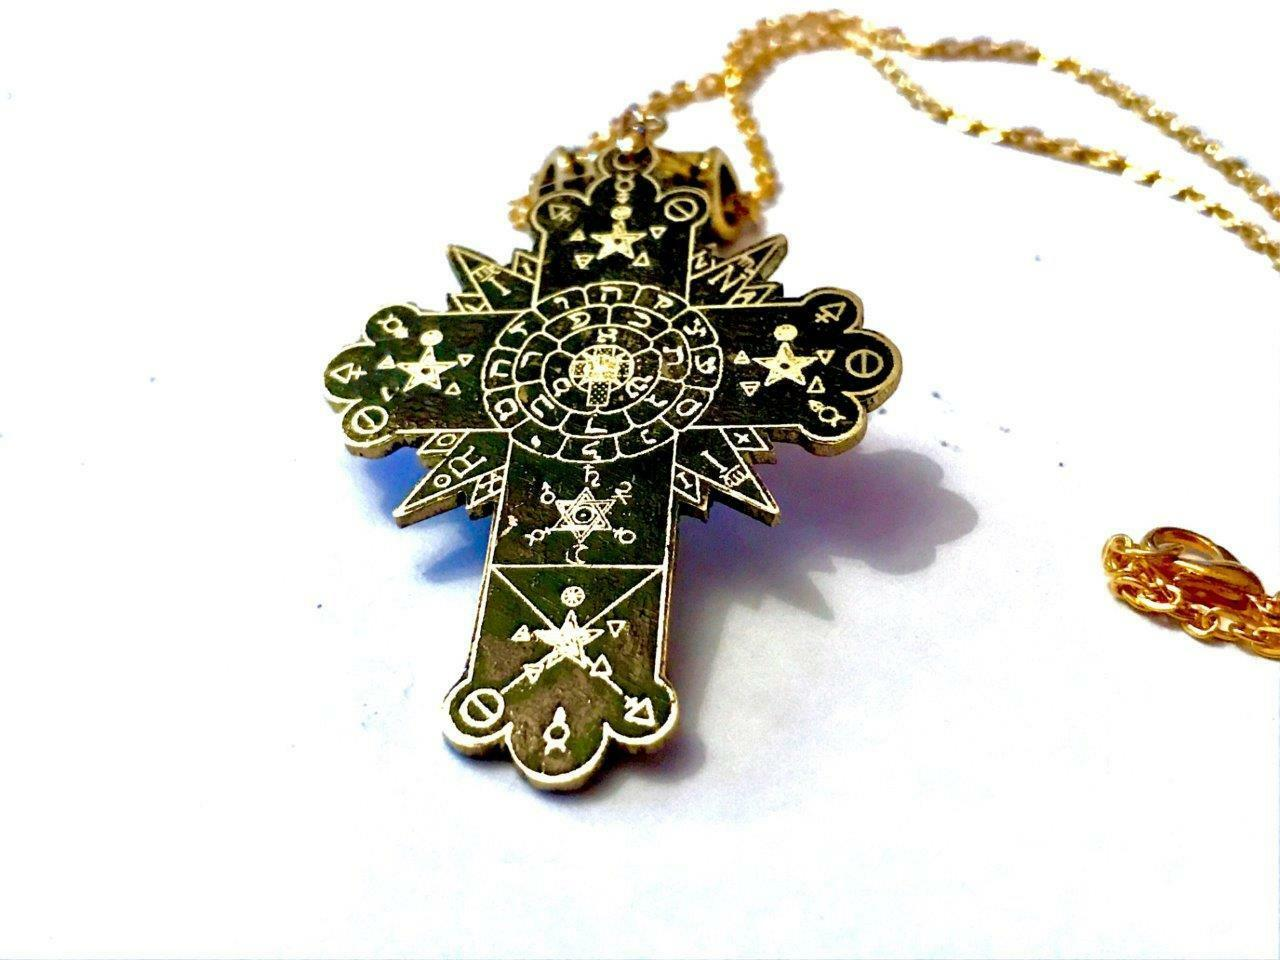 Golden dawn rose cross lamen talisman solid brass rosicrucian golden dawn rose cross lamen talisman solid brass rosicrucian occult magick mozeypictures Image collections